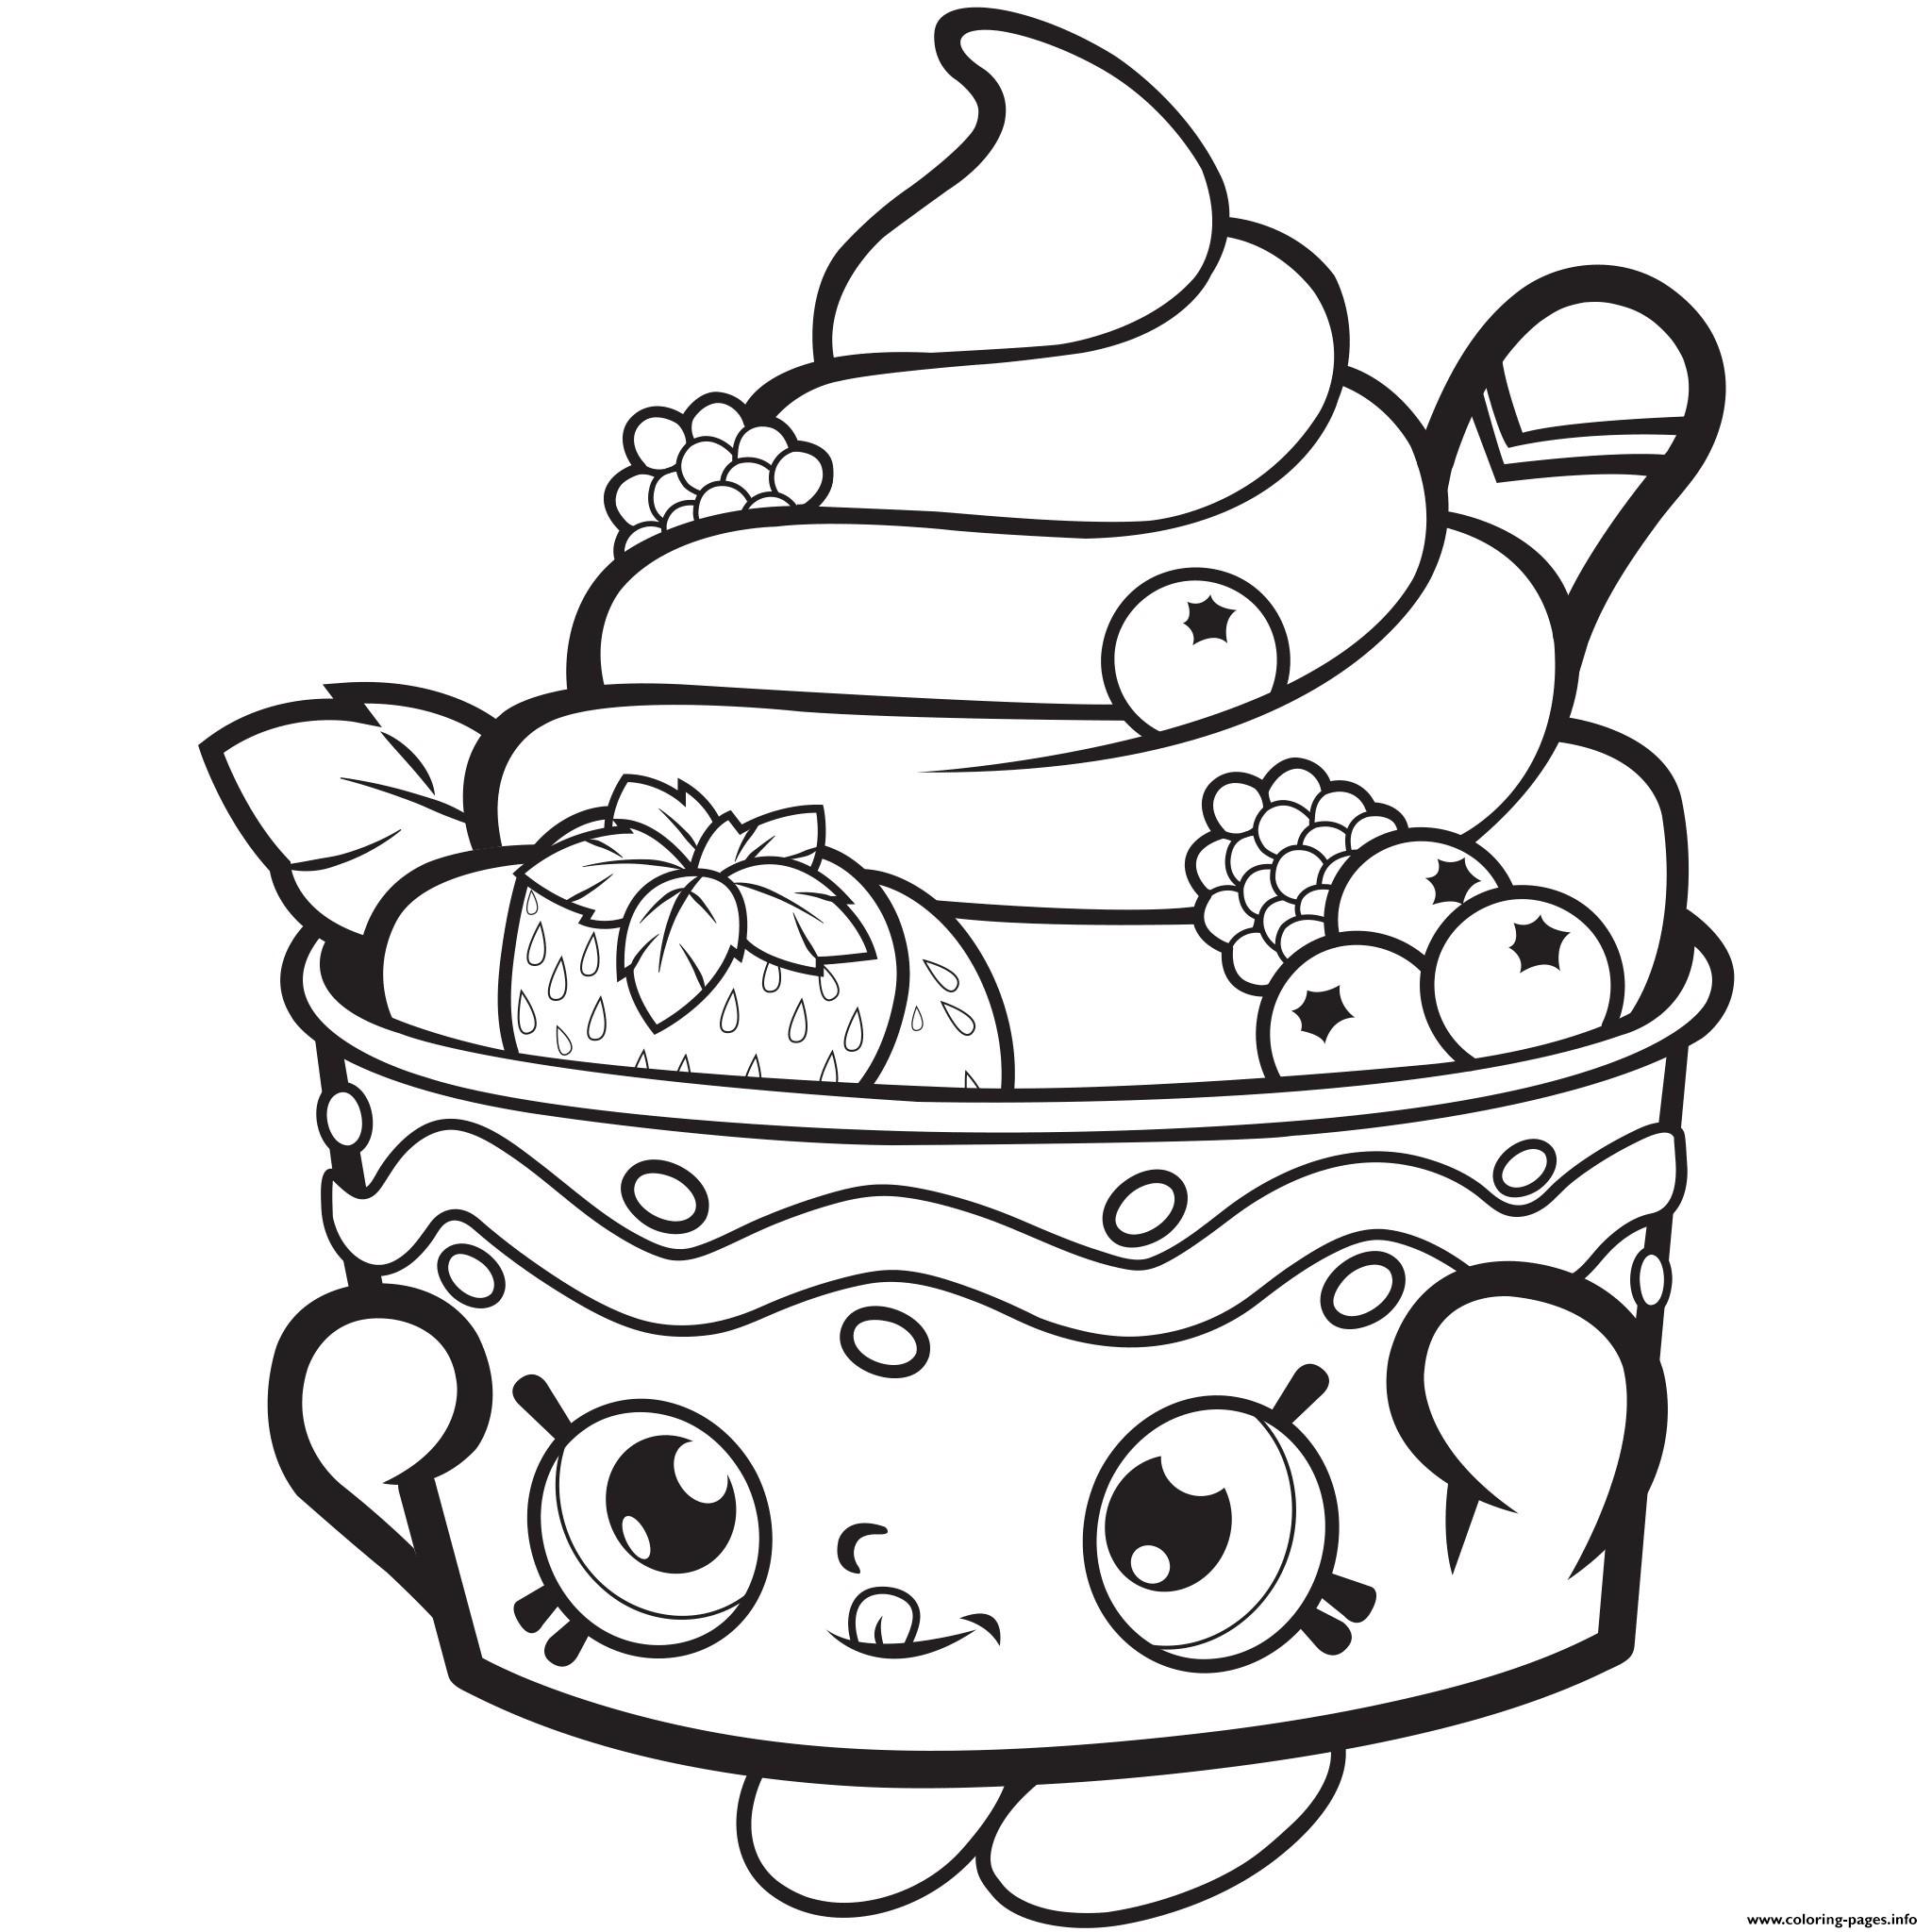 2048x2048 Shopkins Coloring Pages Popcorn Copy Shopkins Coloring Pages Page